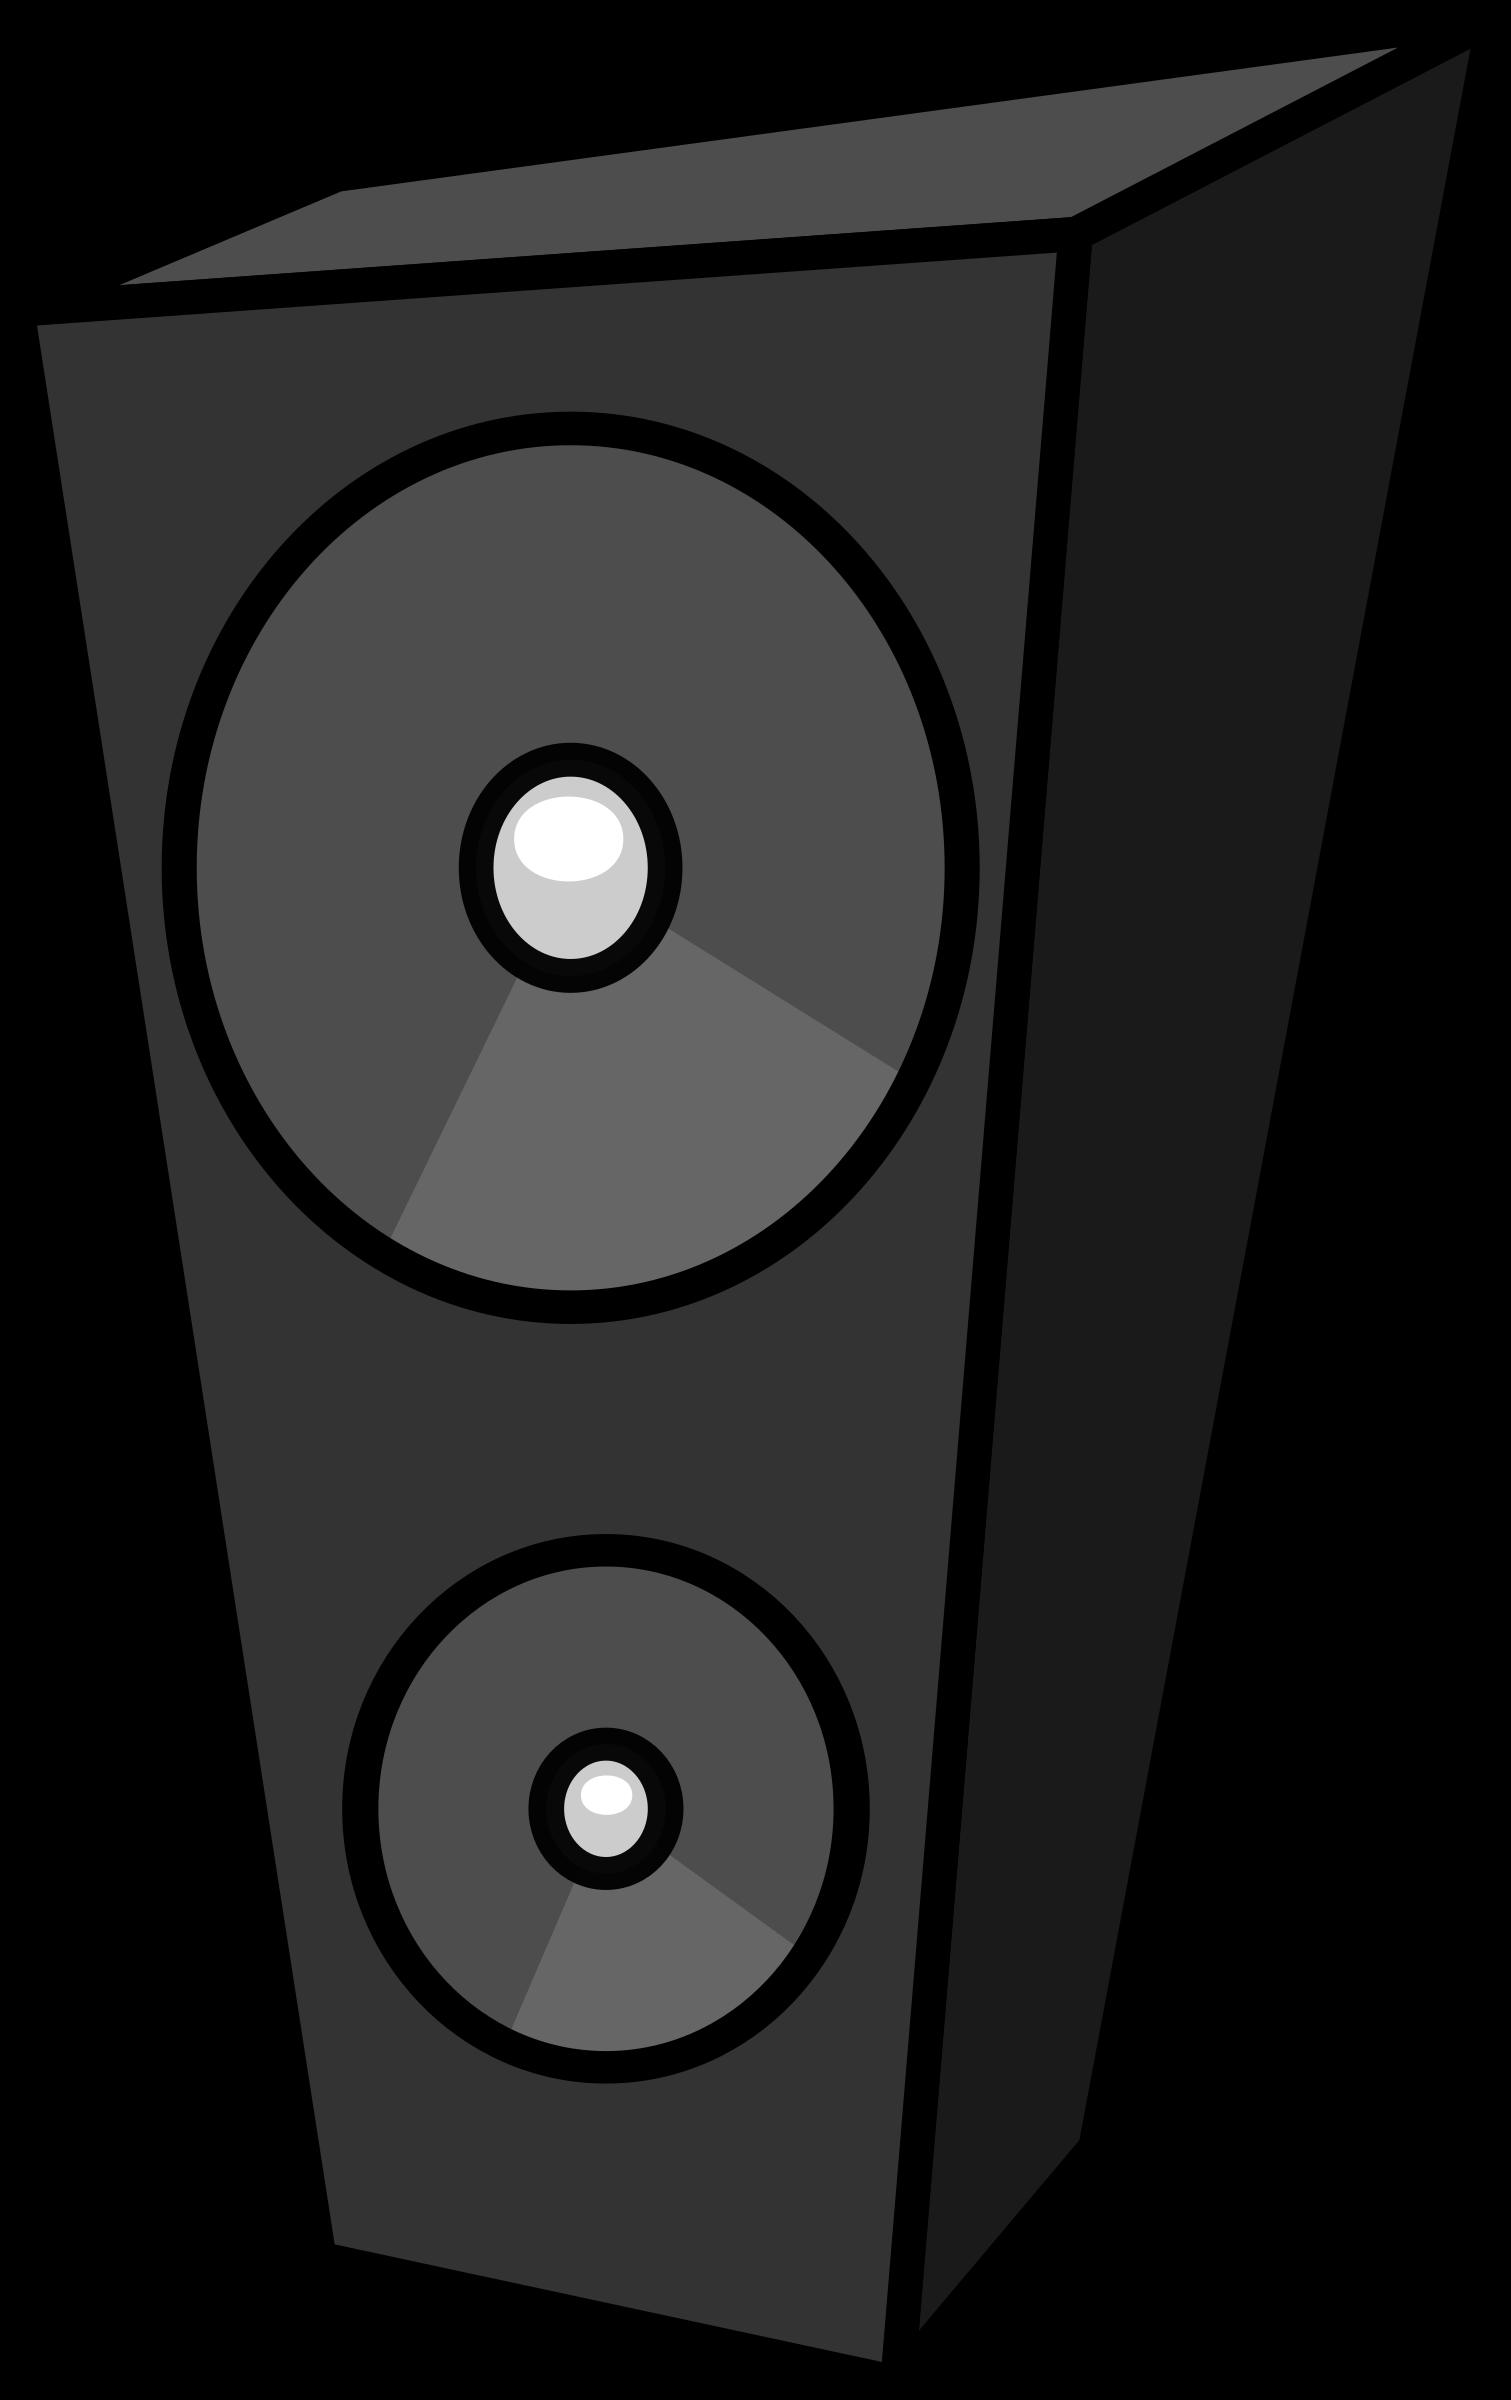 Cartoon speaker big image. Clipart box animated